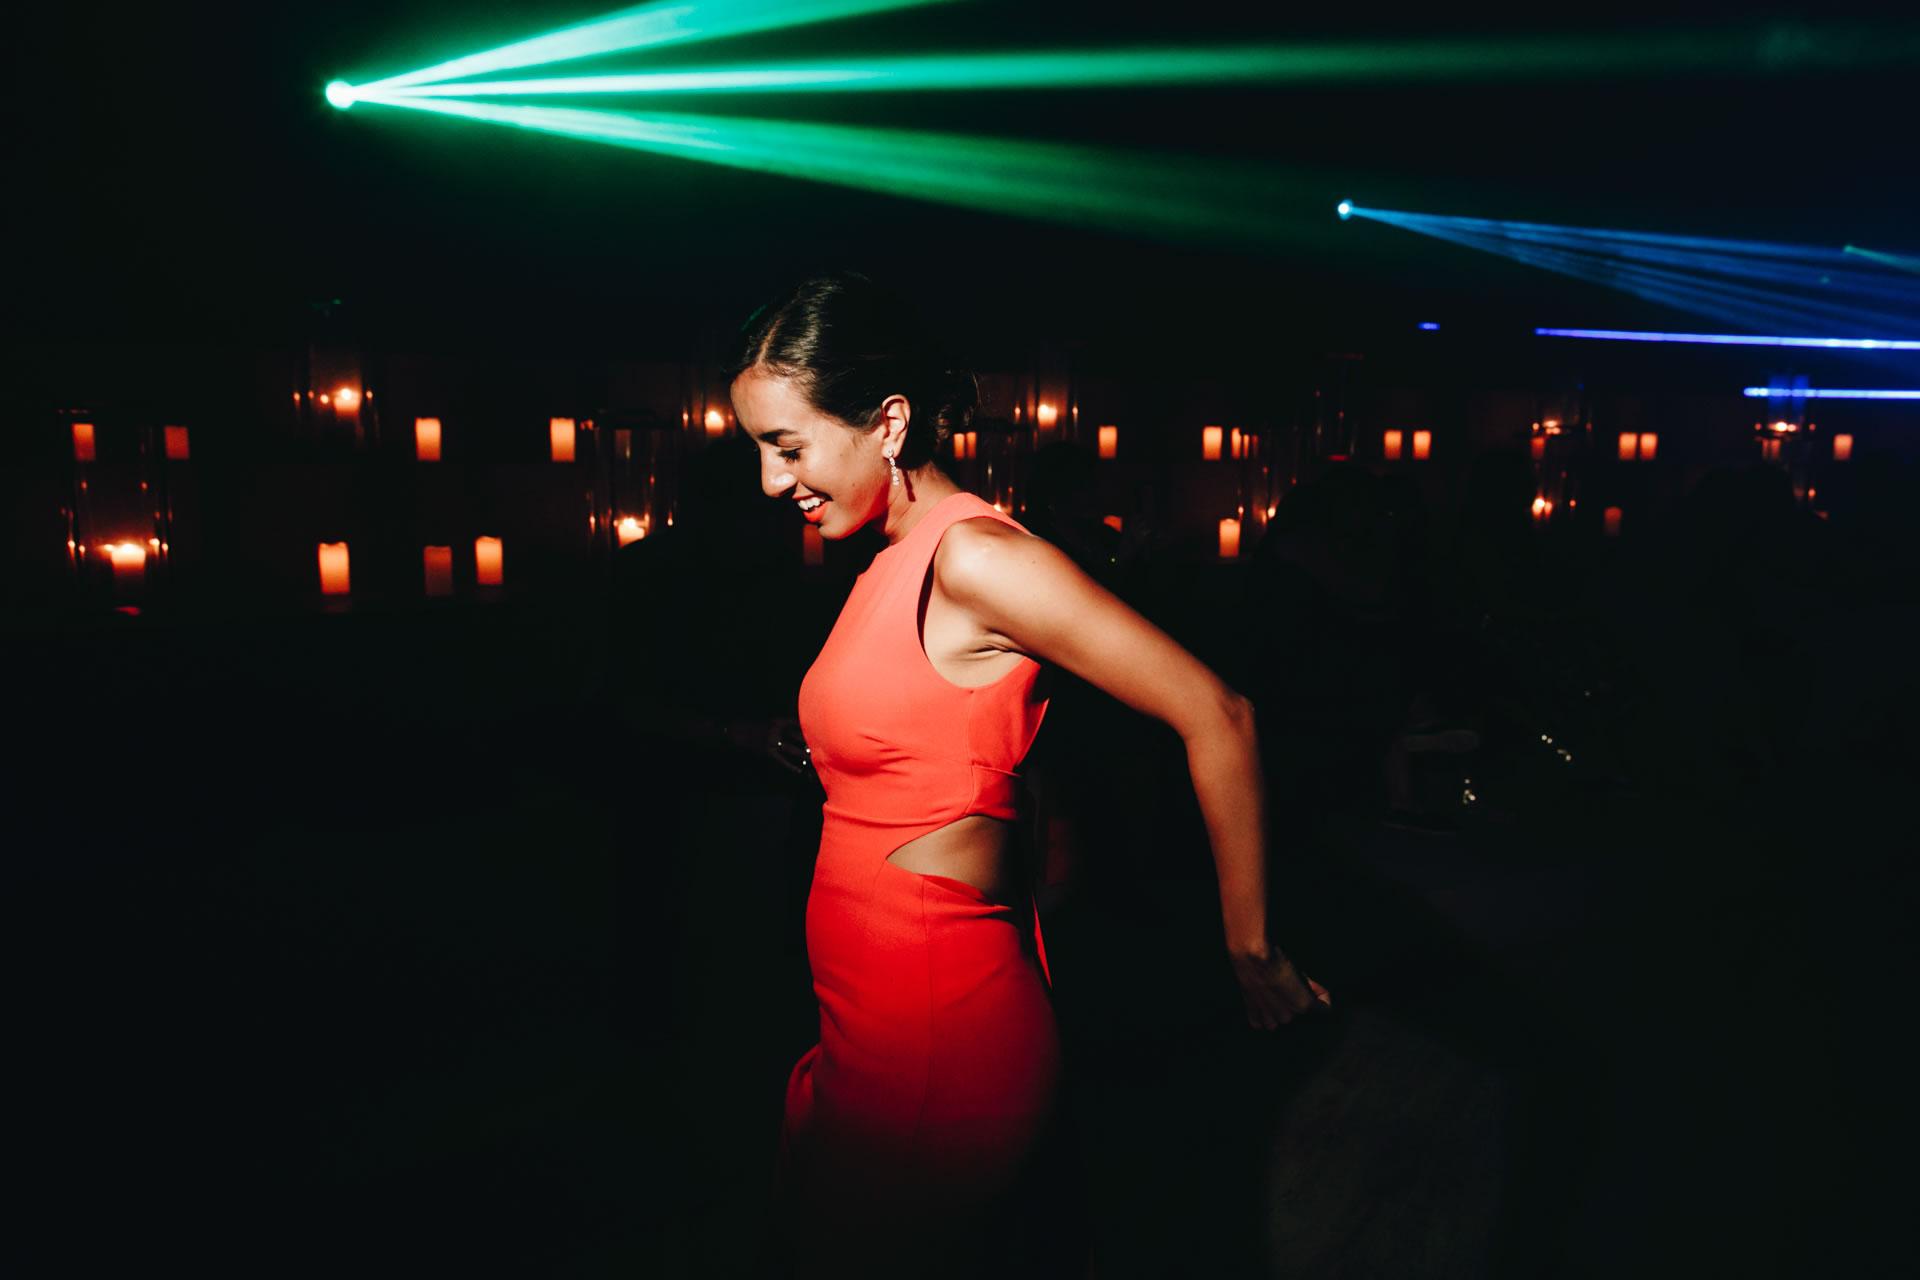 Green - 88 :: Luxury wedding at Il Borro :: Luxury wedding photography - 87 :: Green - 88